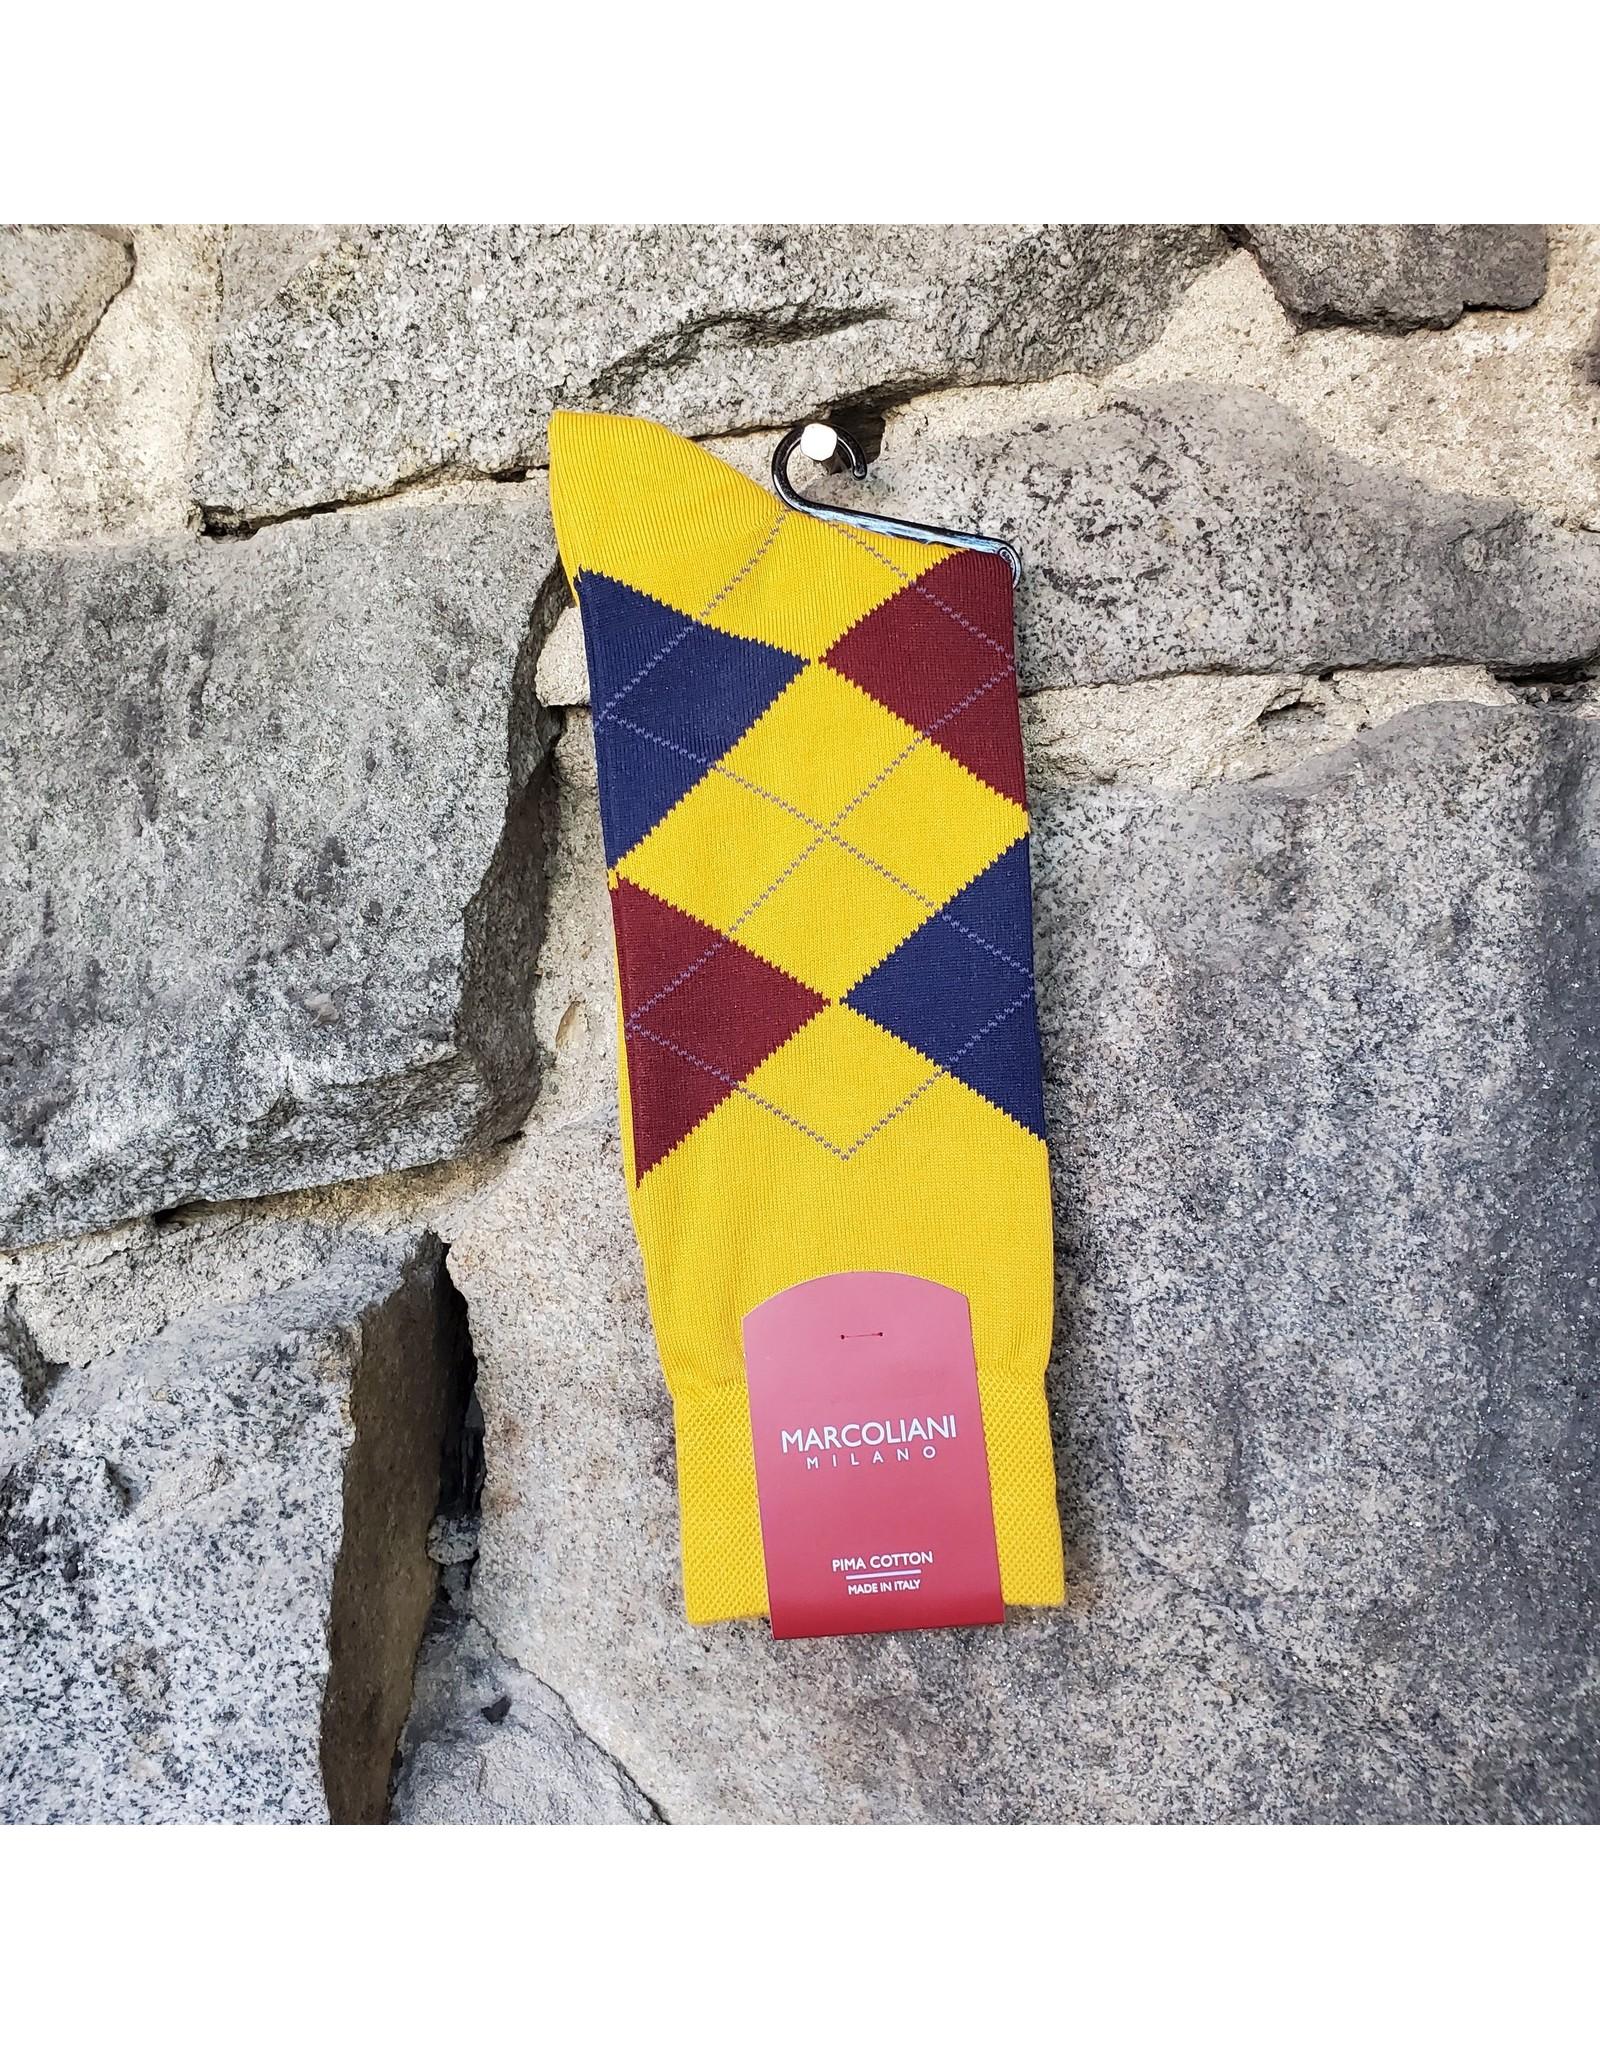 Marcoliani Marcoliani Pima Cotton Socks - Mustard Argyle